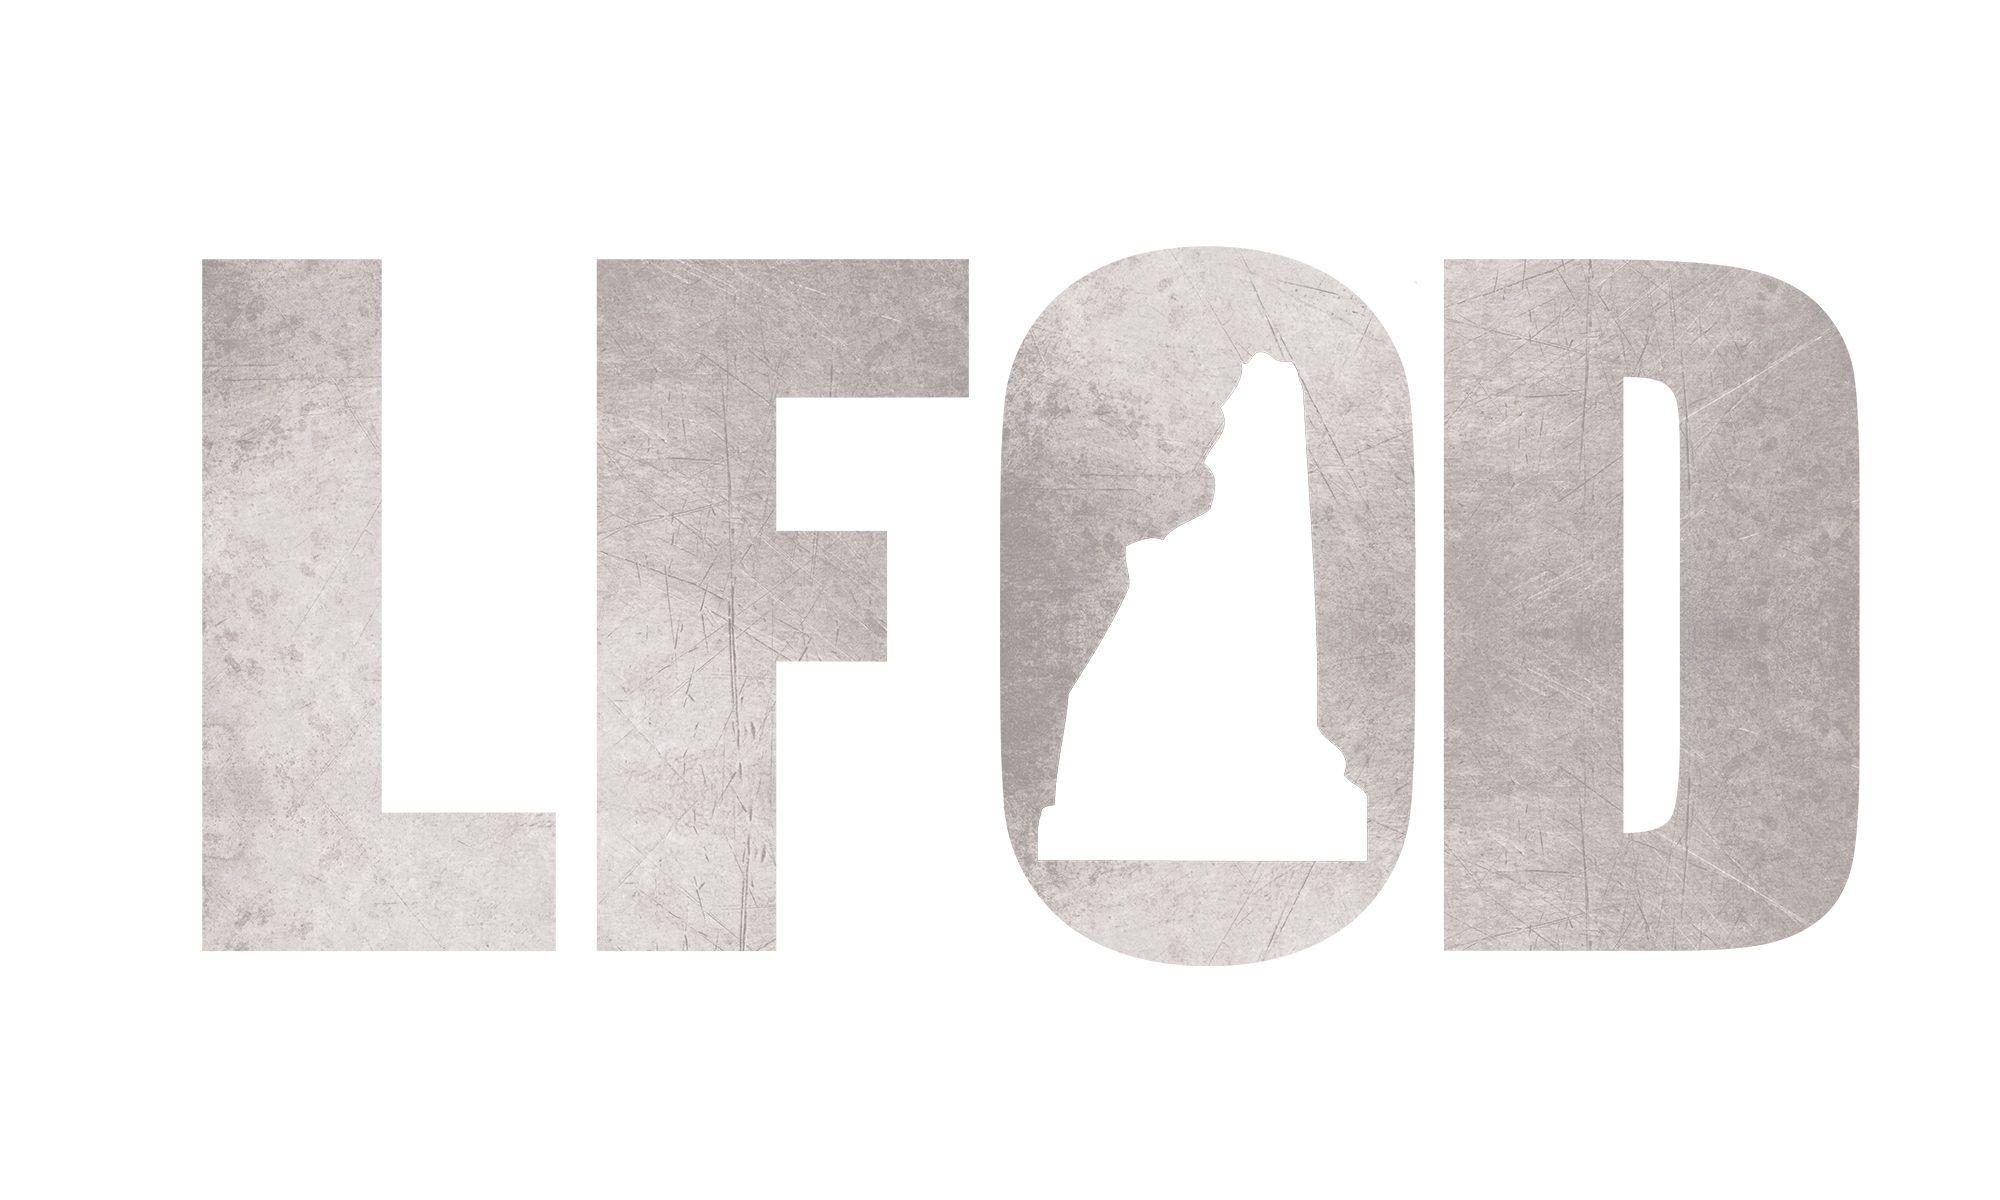 LFOD Life